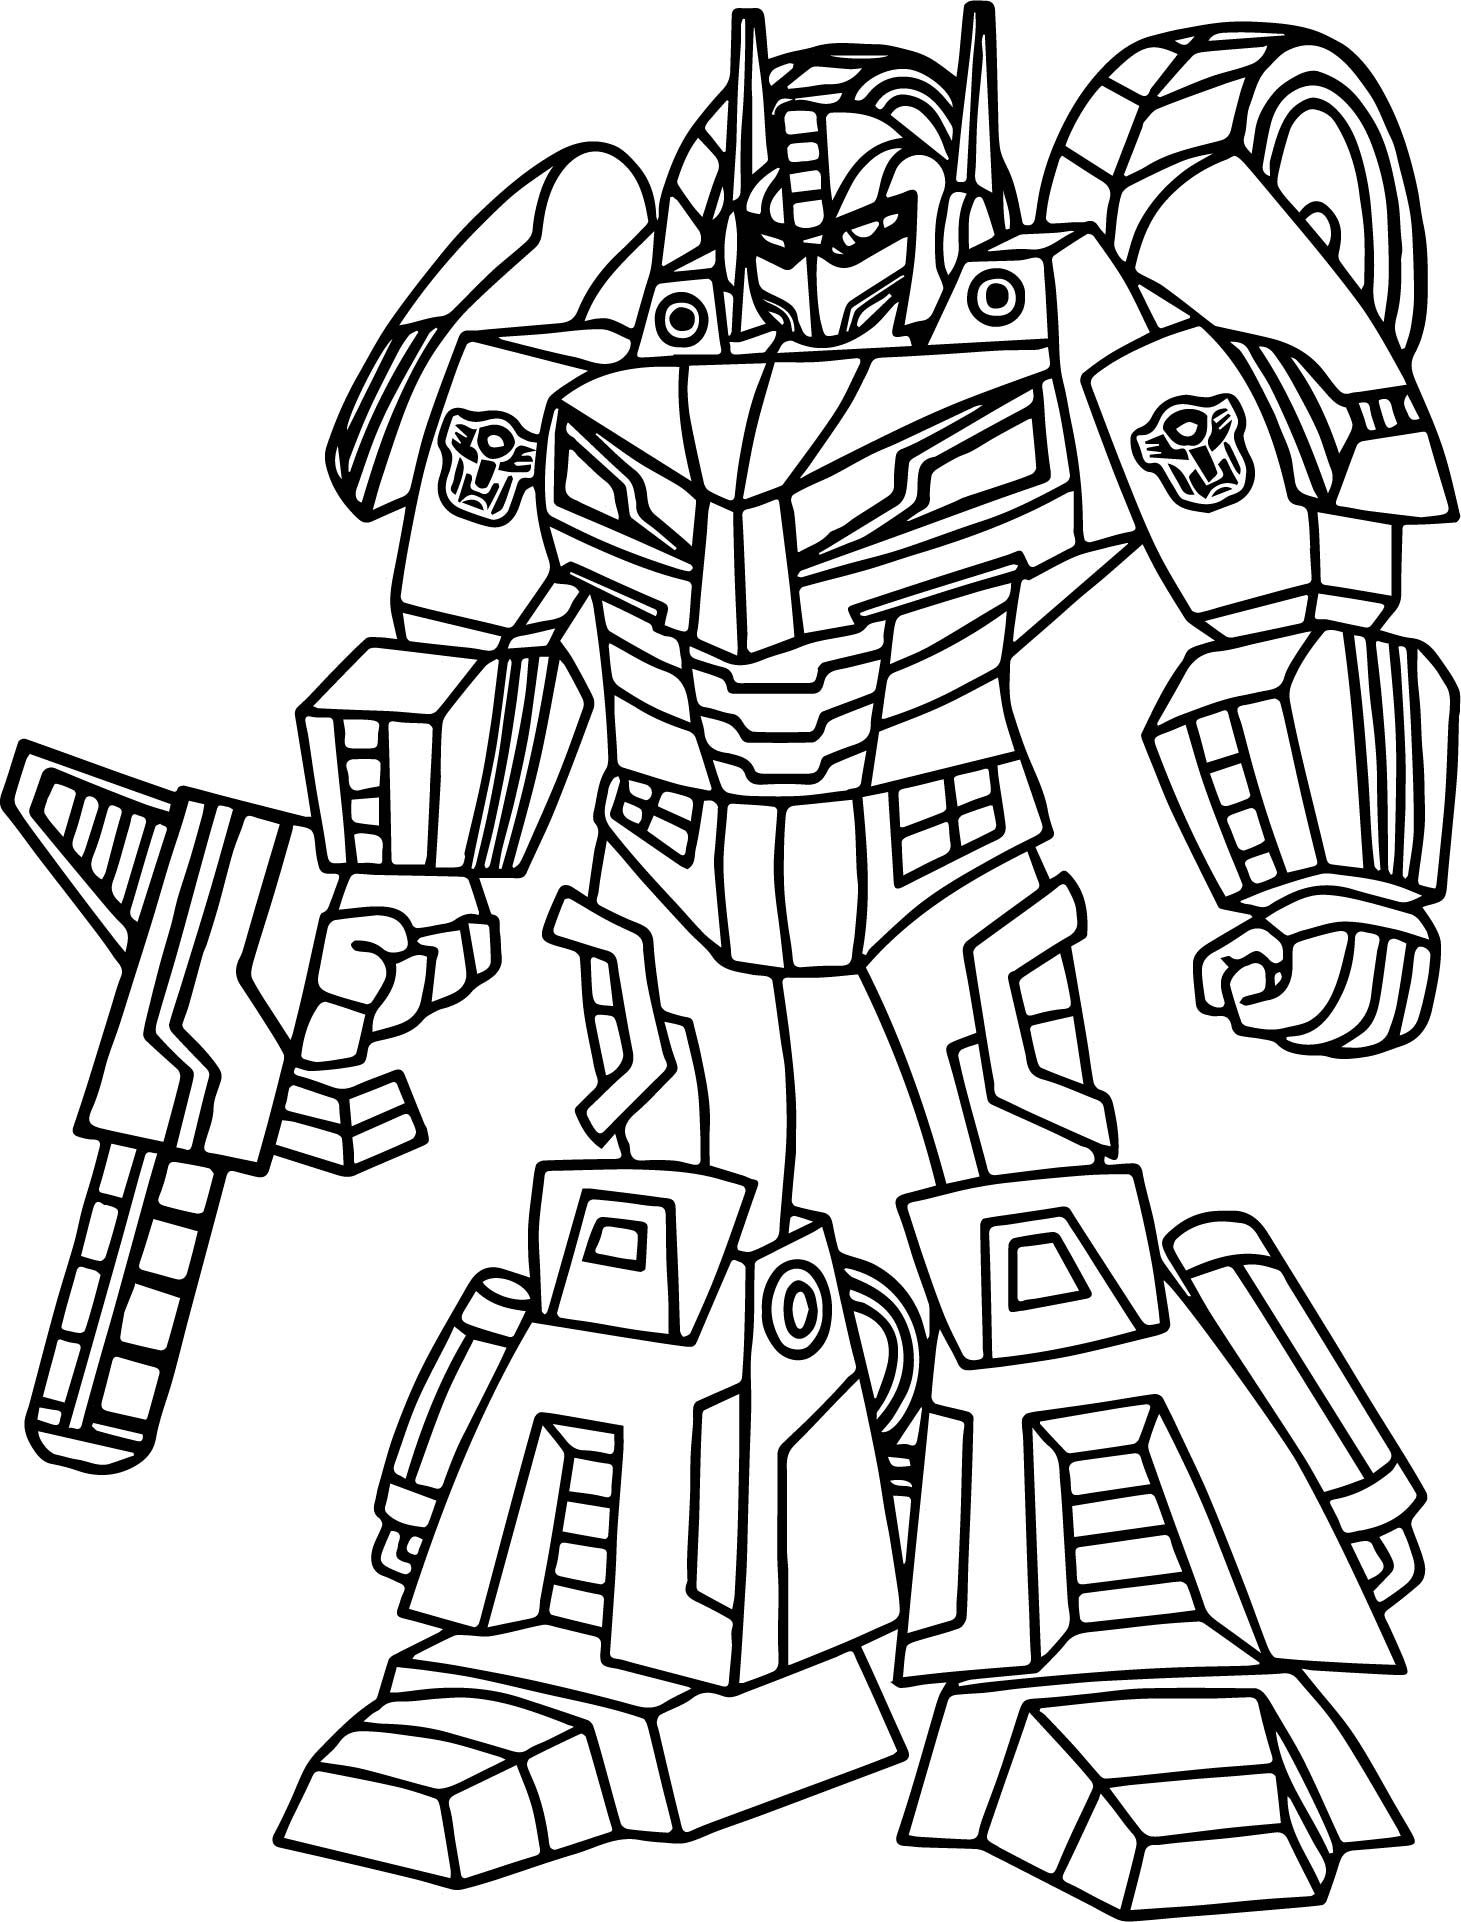 Transformers Drawing at GetDrawings | Free download